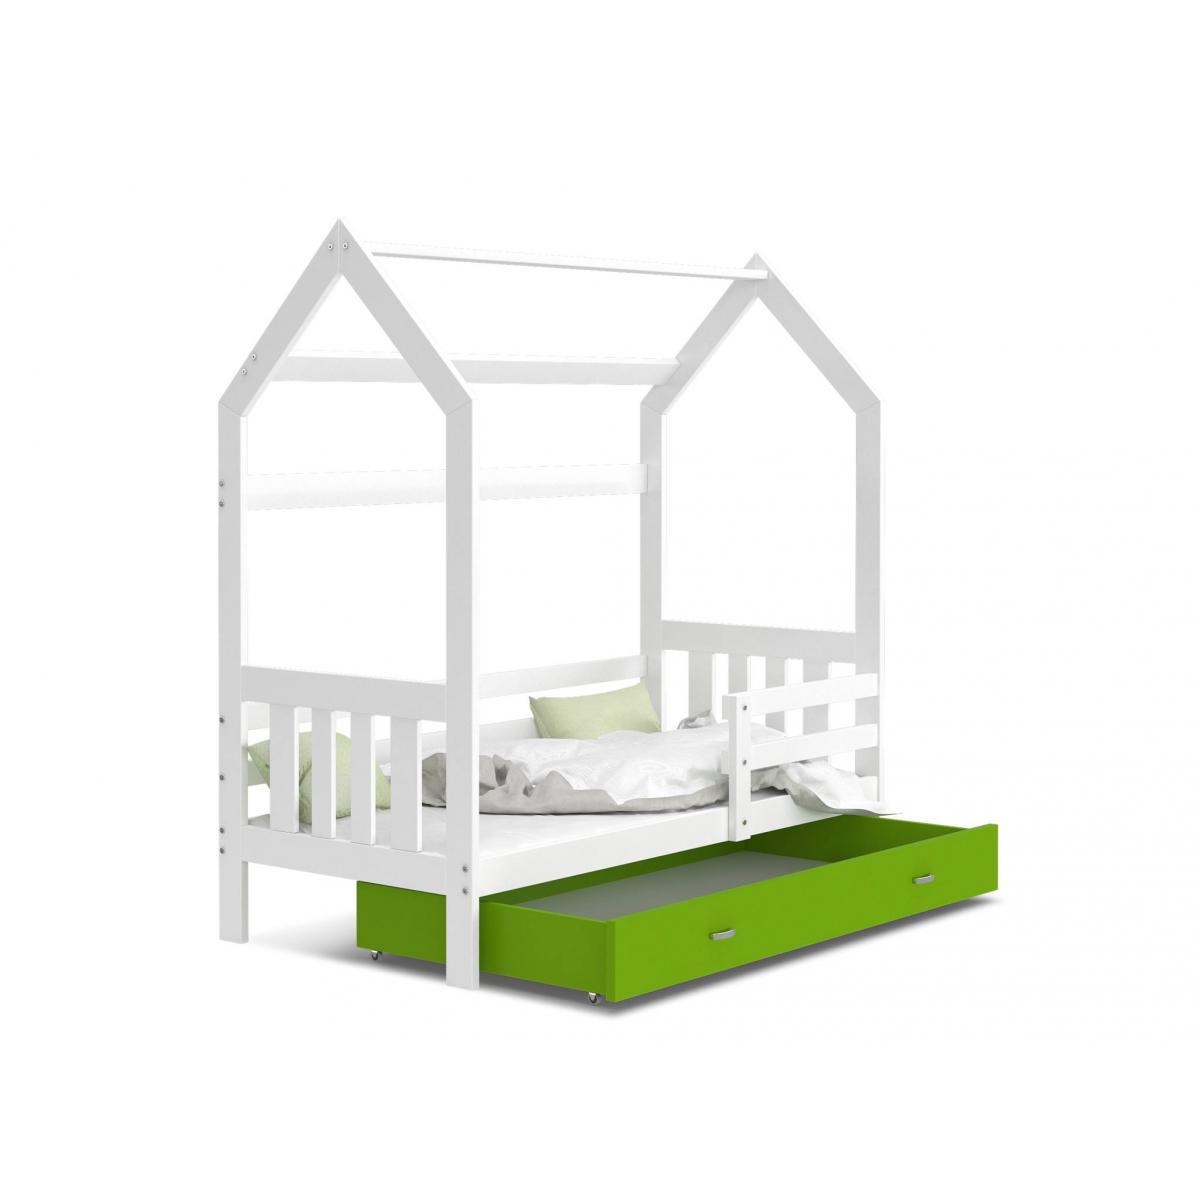 Kids Literie Lit cabane 2 Blanc-Vert 80x160livré avec sommier, tiroir et matelas de 7cm OFFERT.